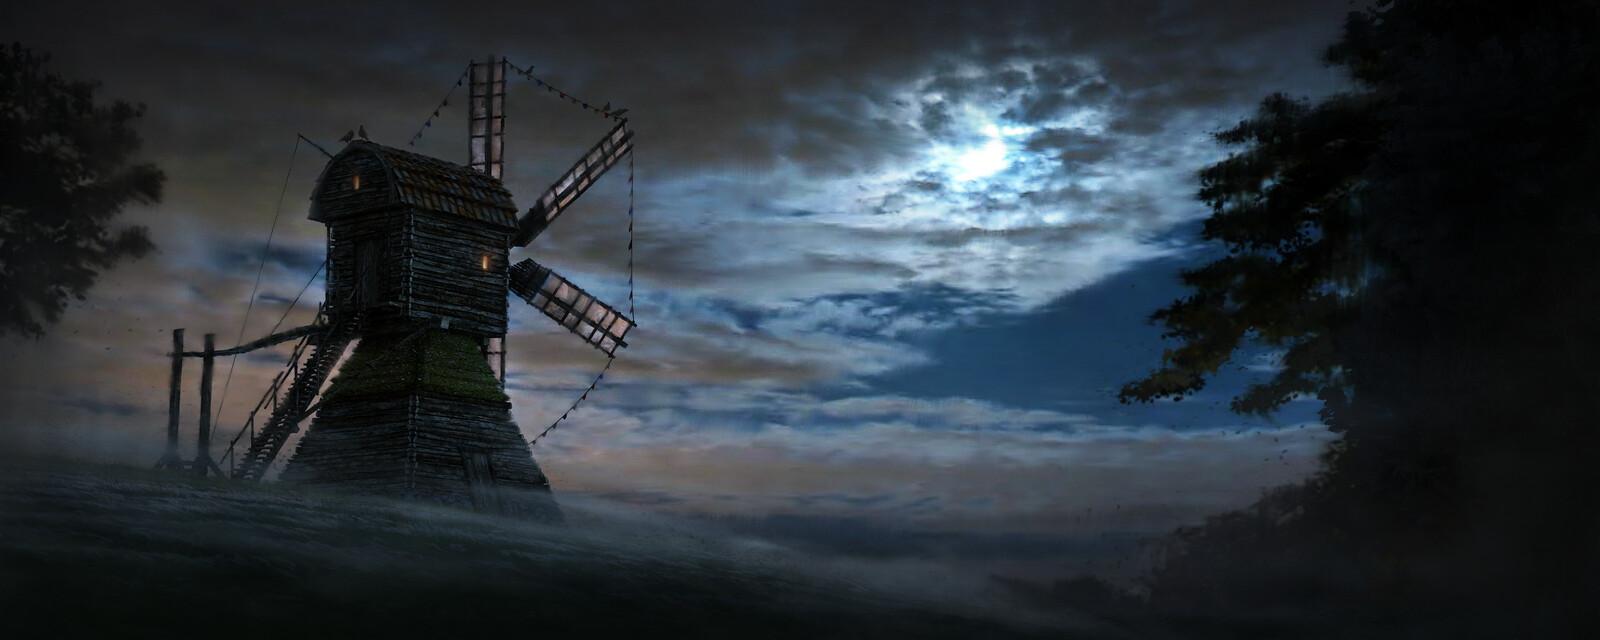 Windmill In Moon Light